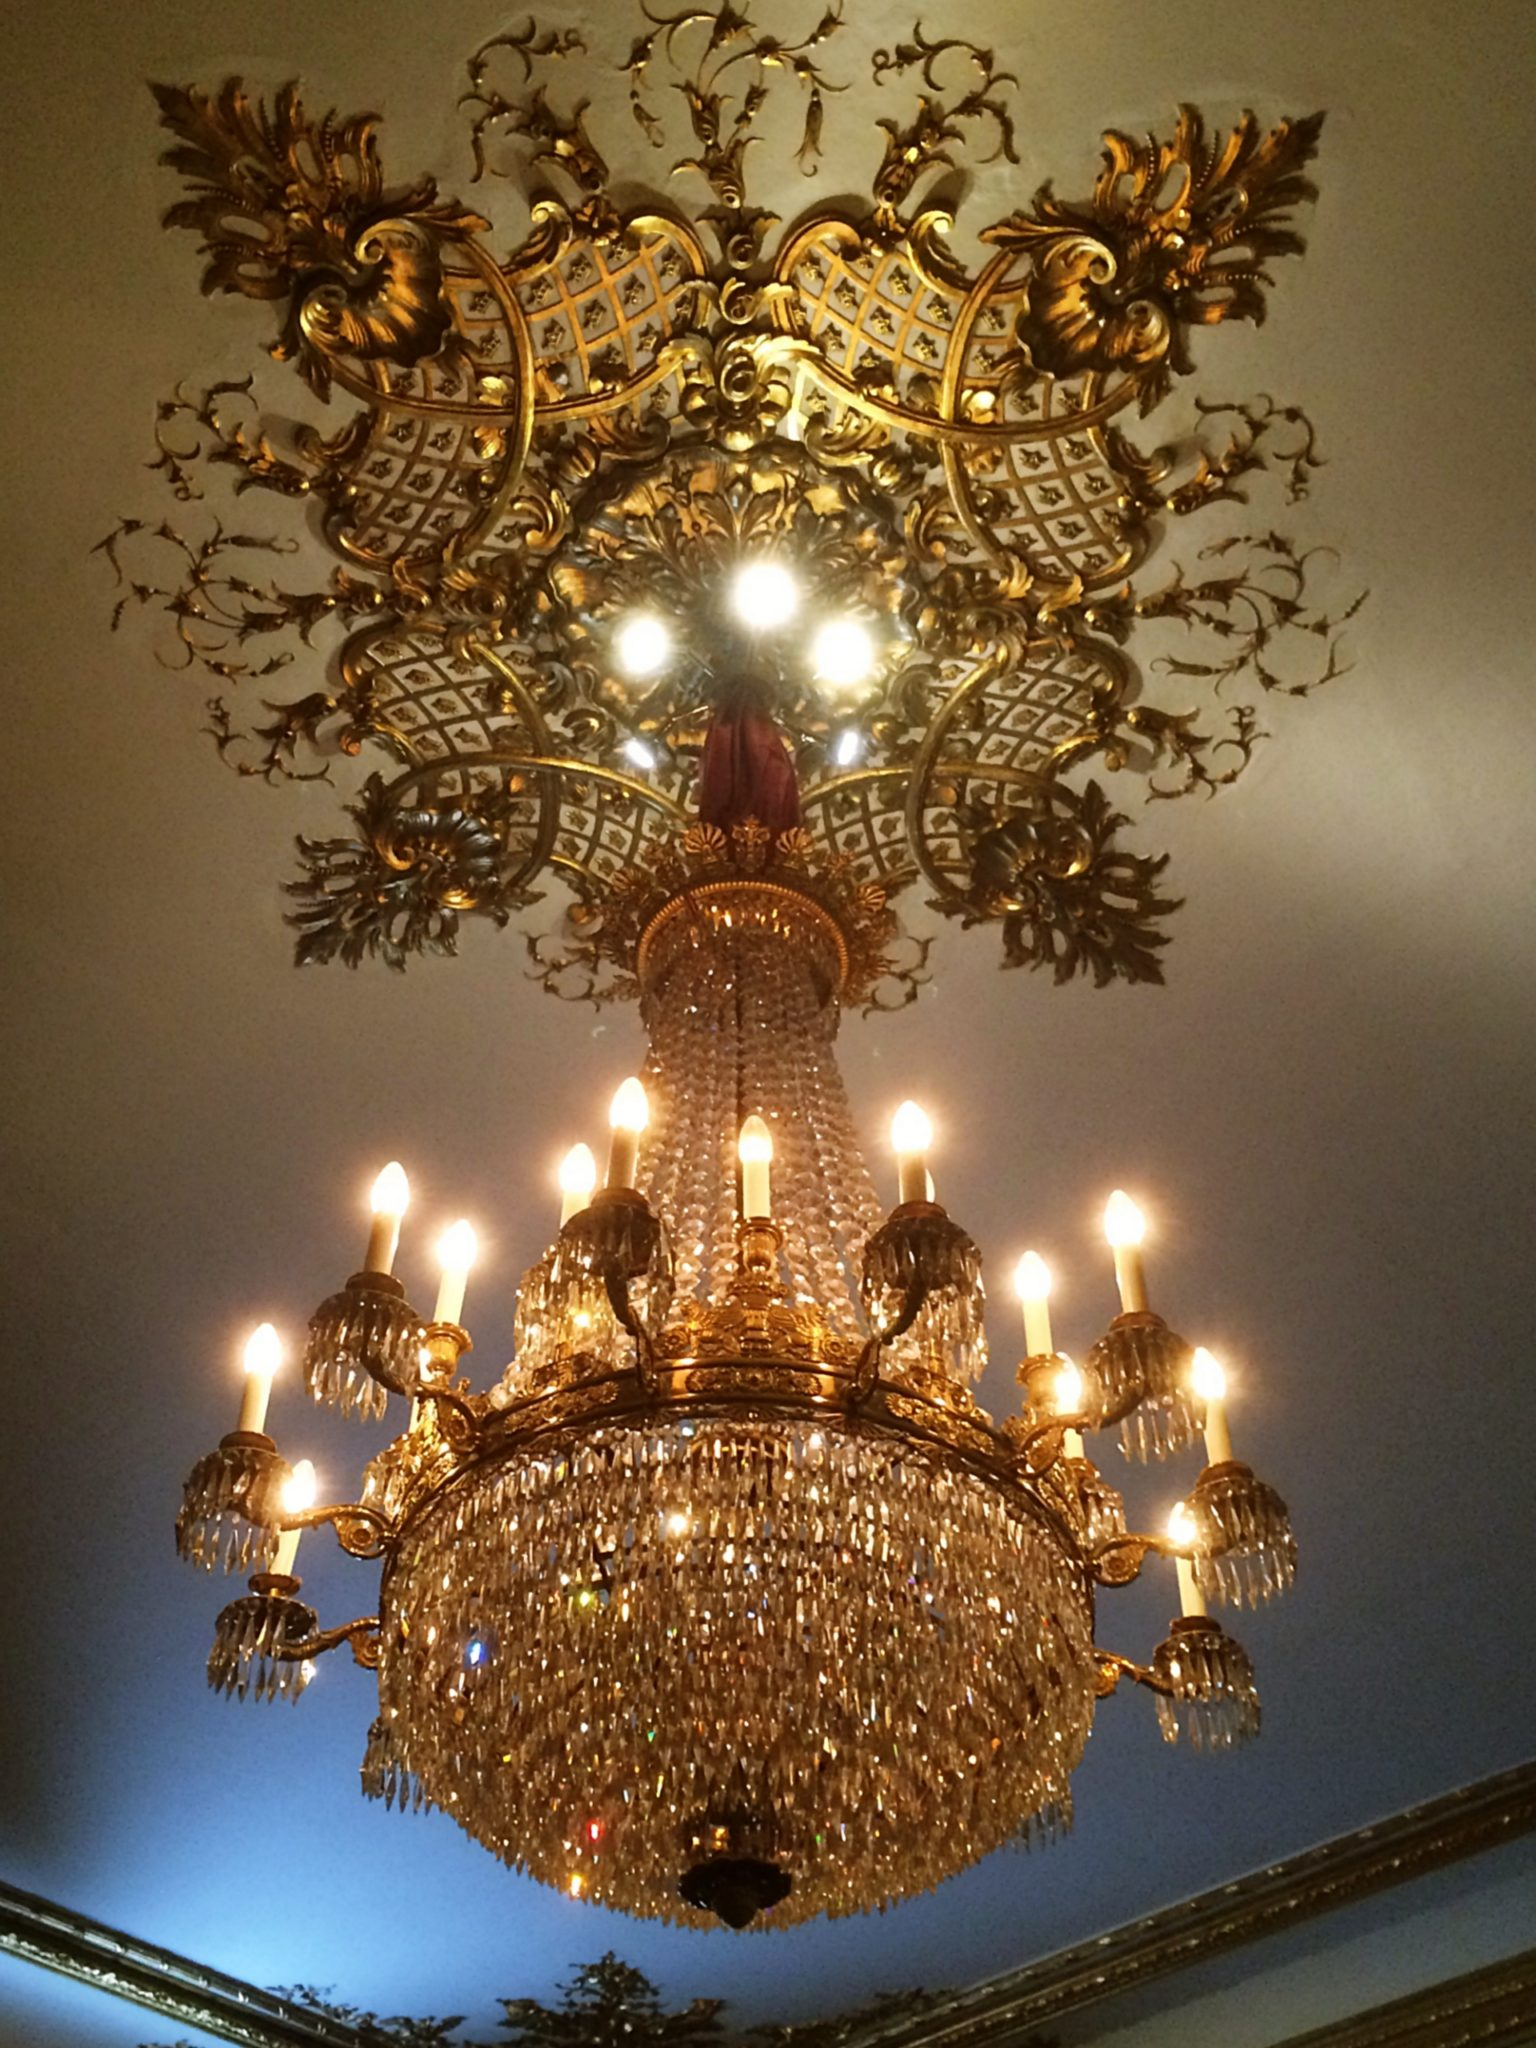 Stockholm Royal Palace Chandelier